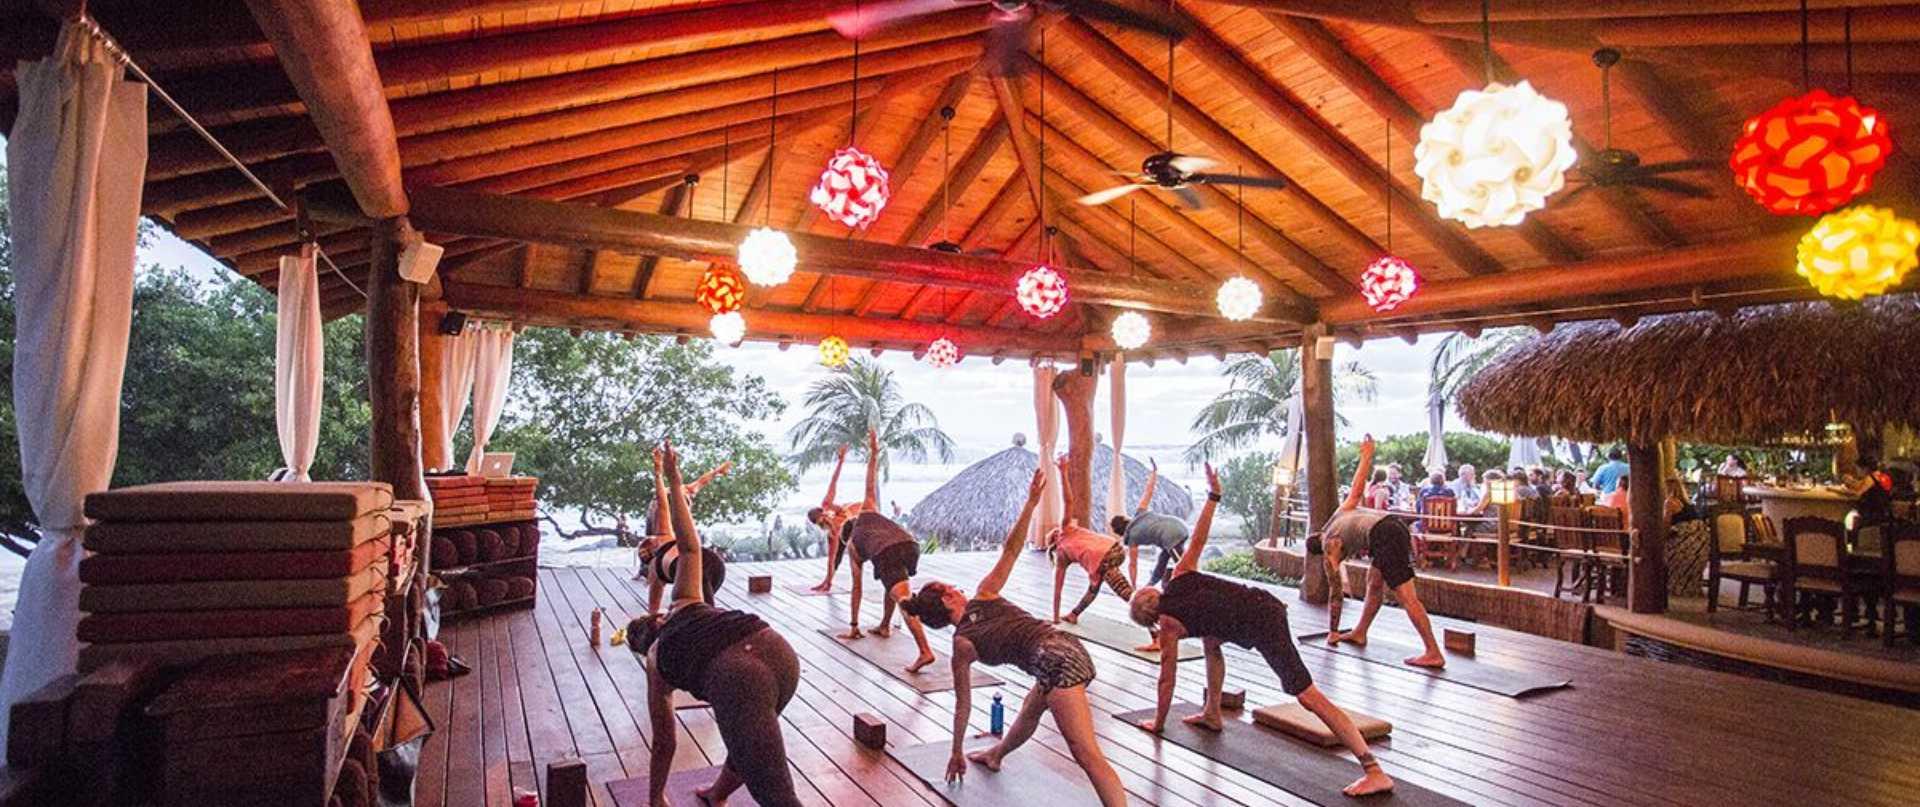 Yoga-Present-Moment